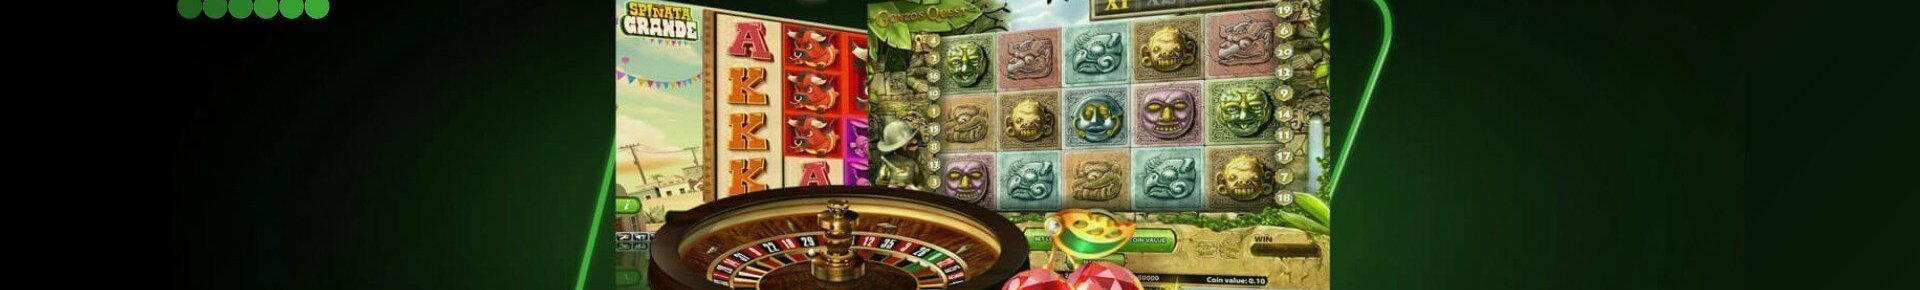 Unibet casino review UK